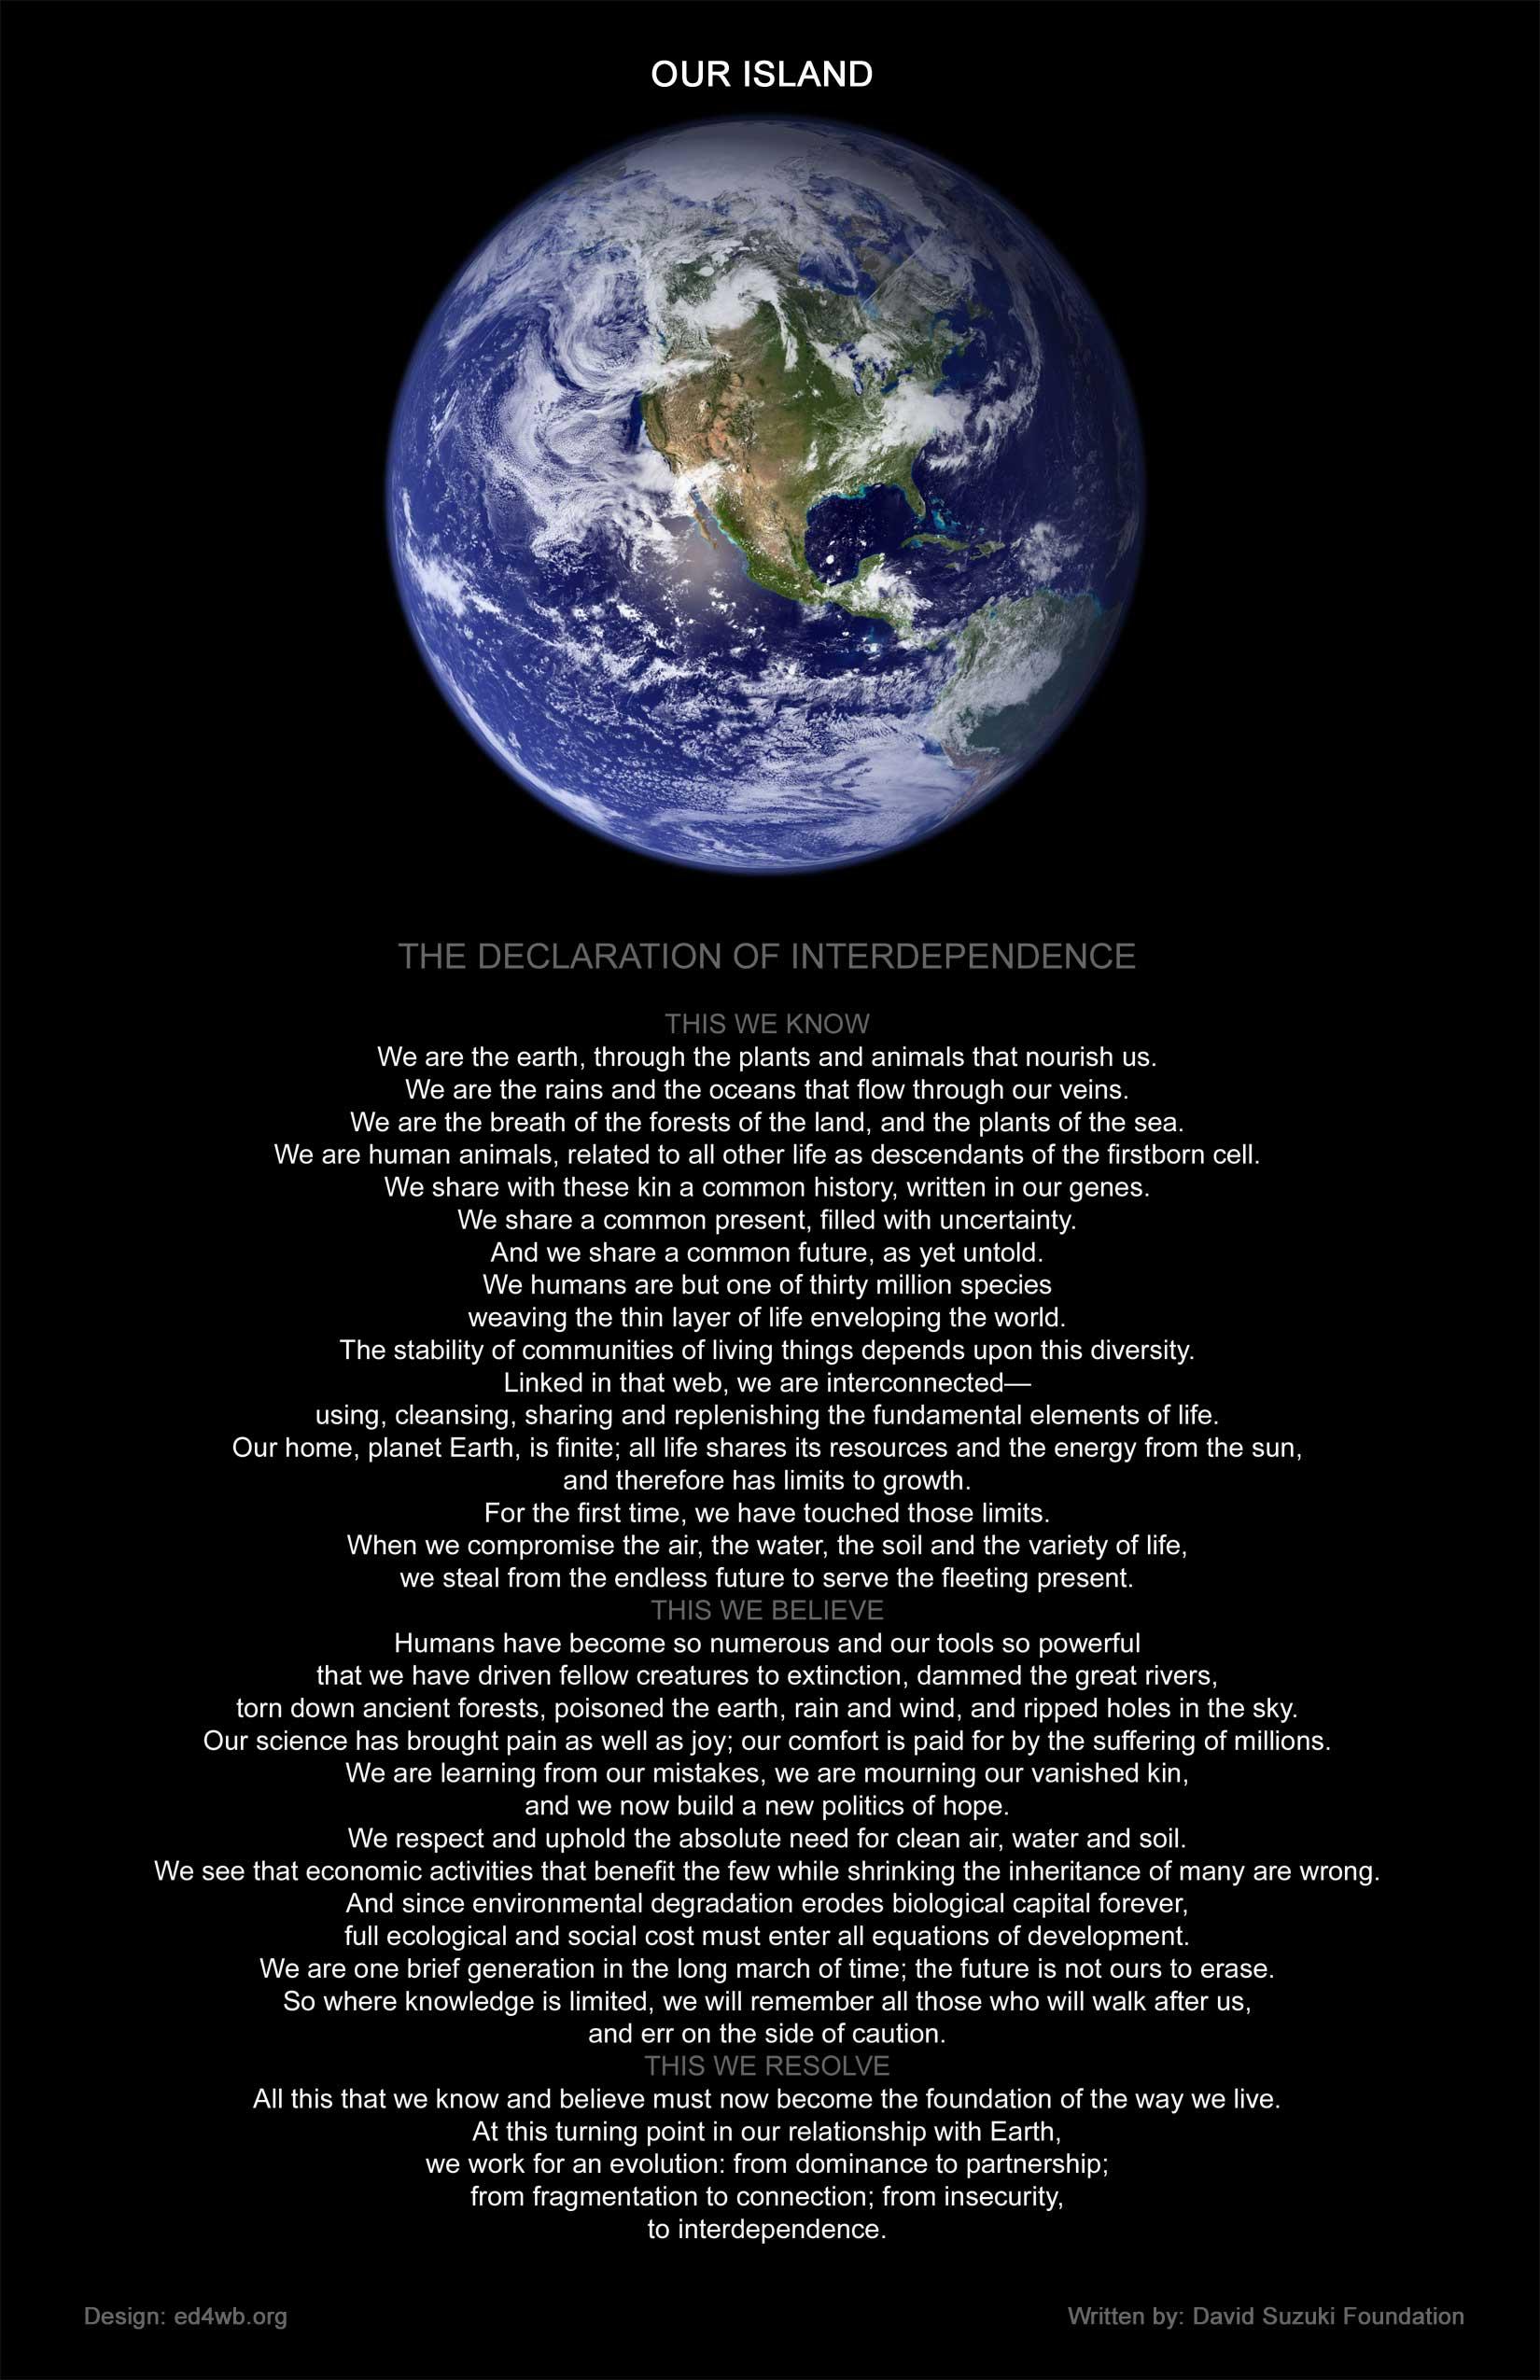 the declaration of interdependence by david suzuki and tara